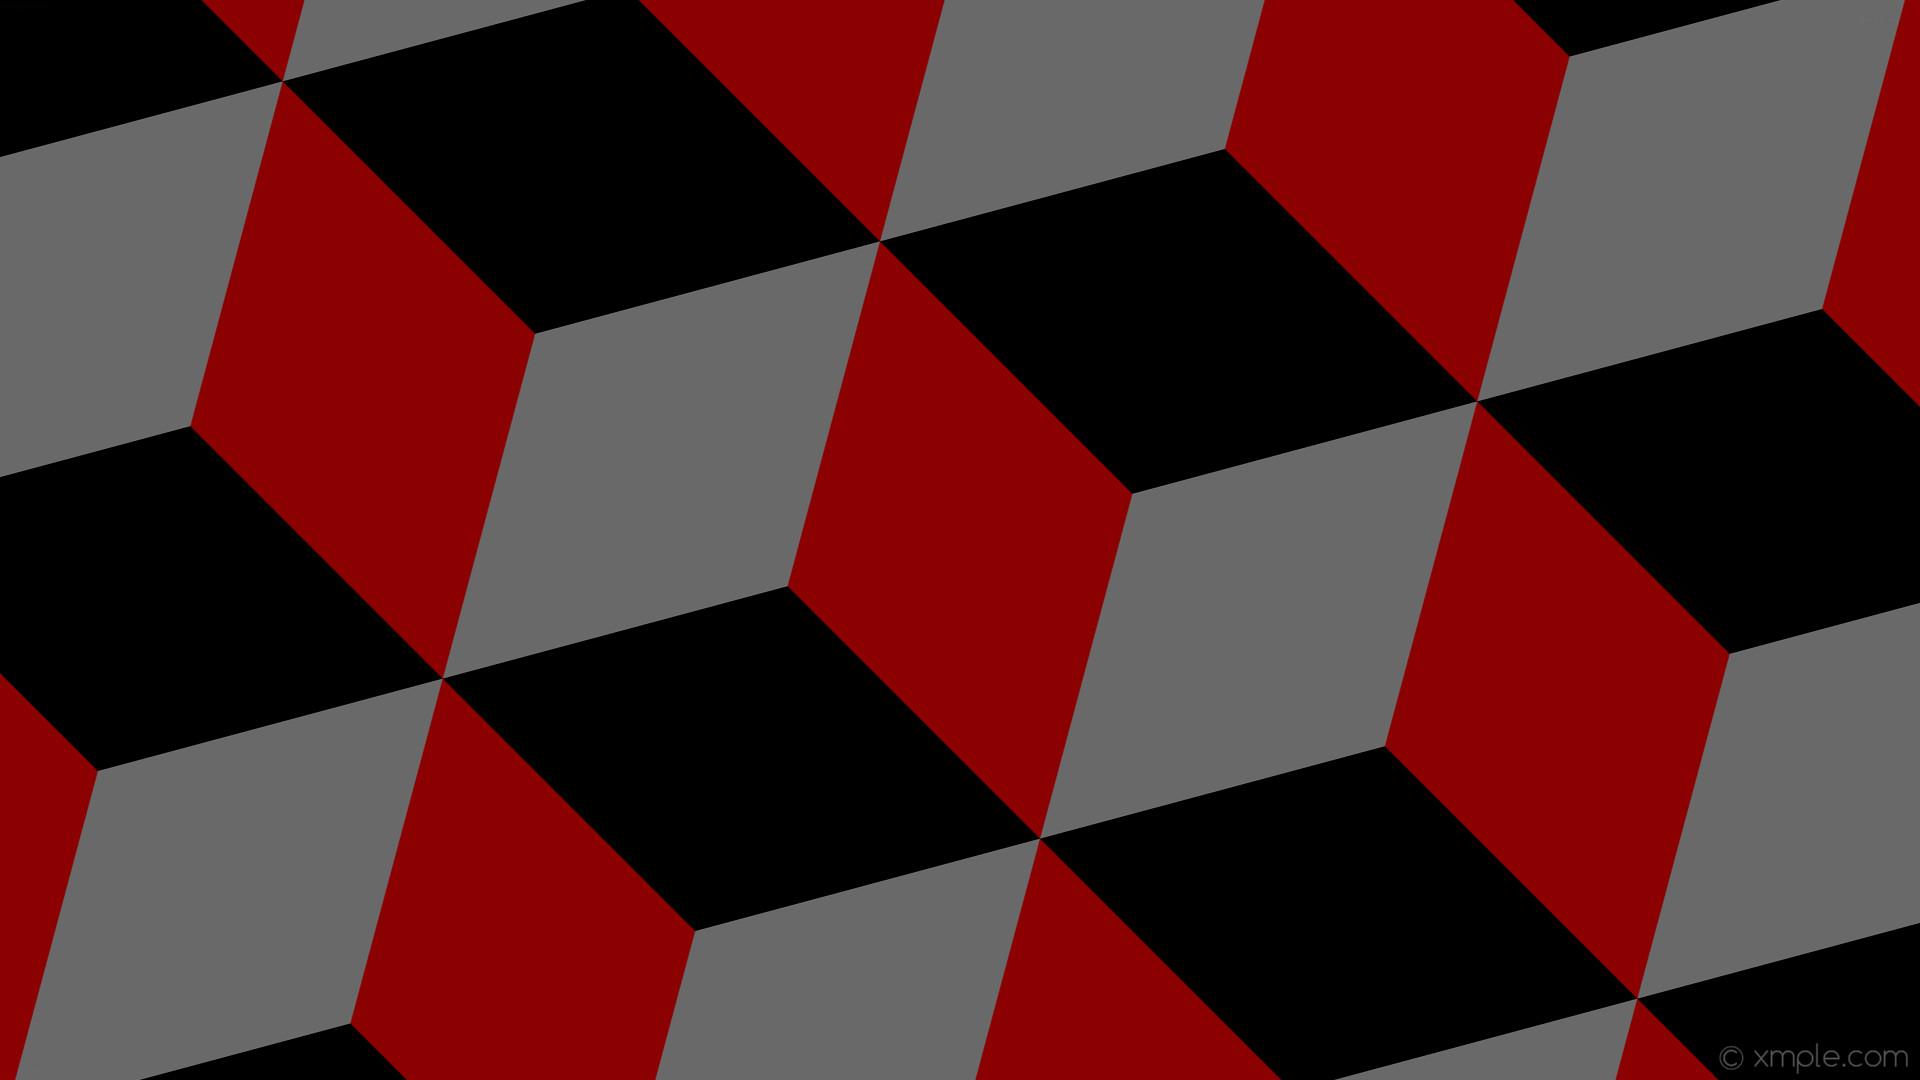 wallpaper red grey 3d cubes black dark red dim gray #8b0000 #696969 #000000